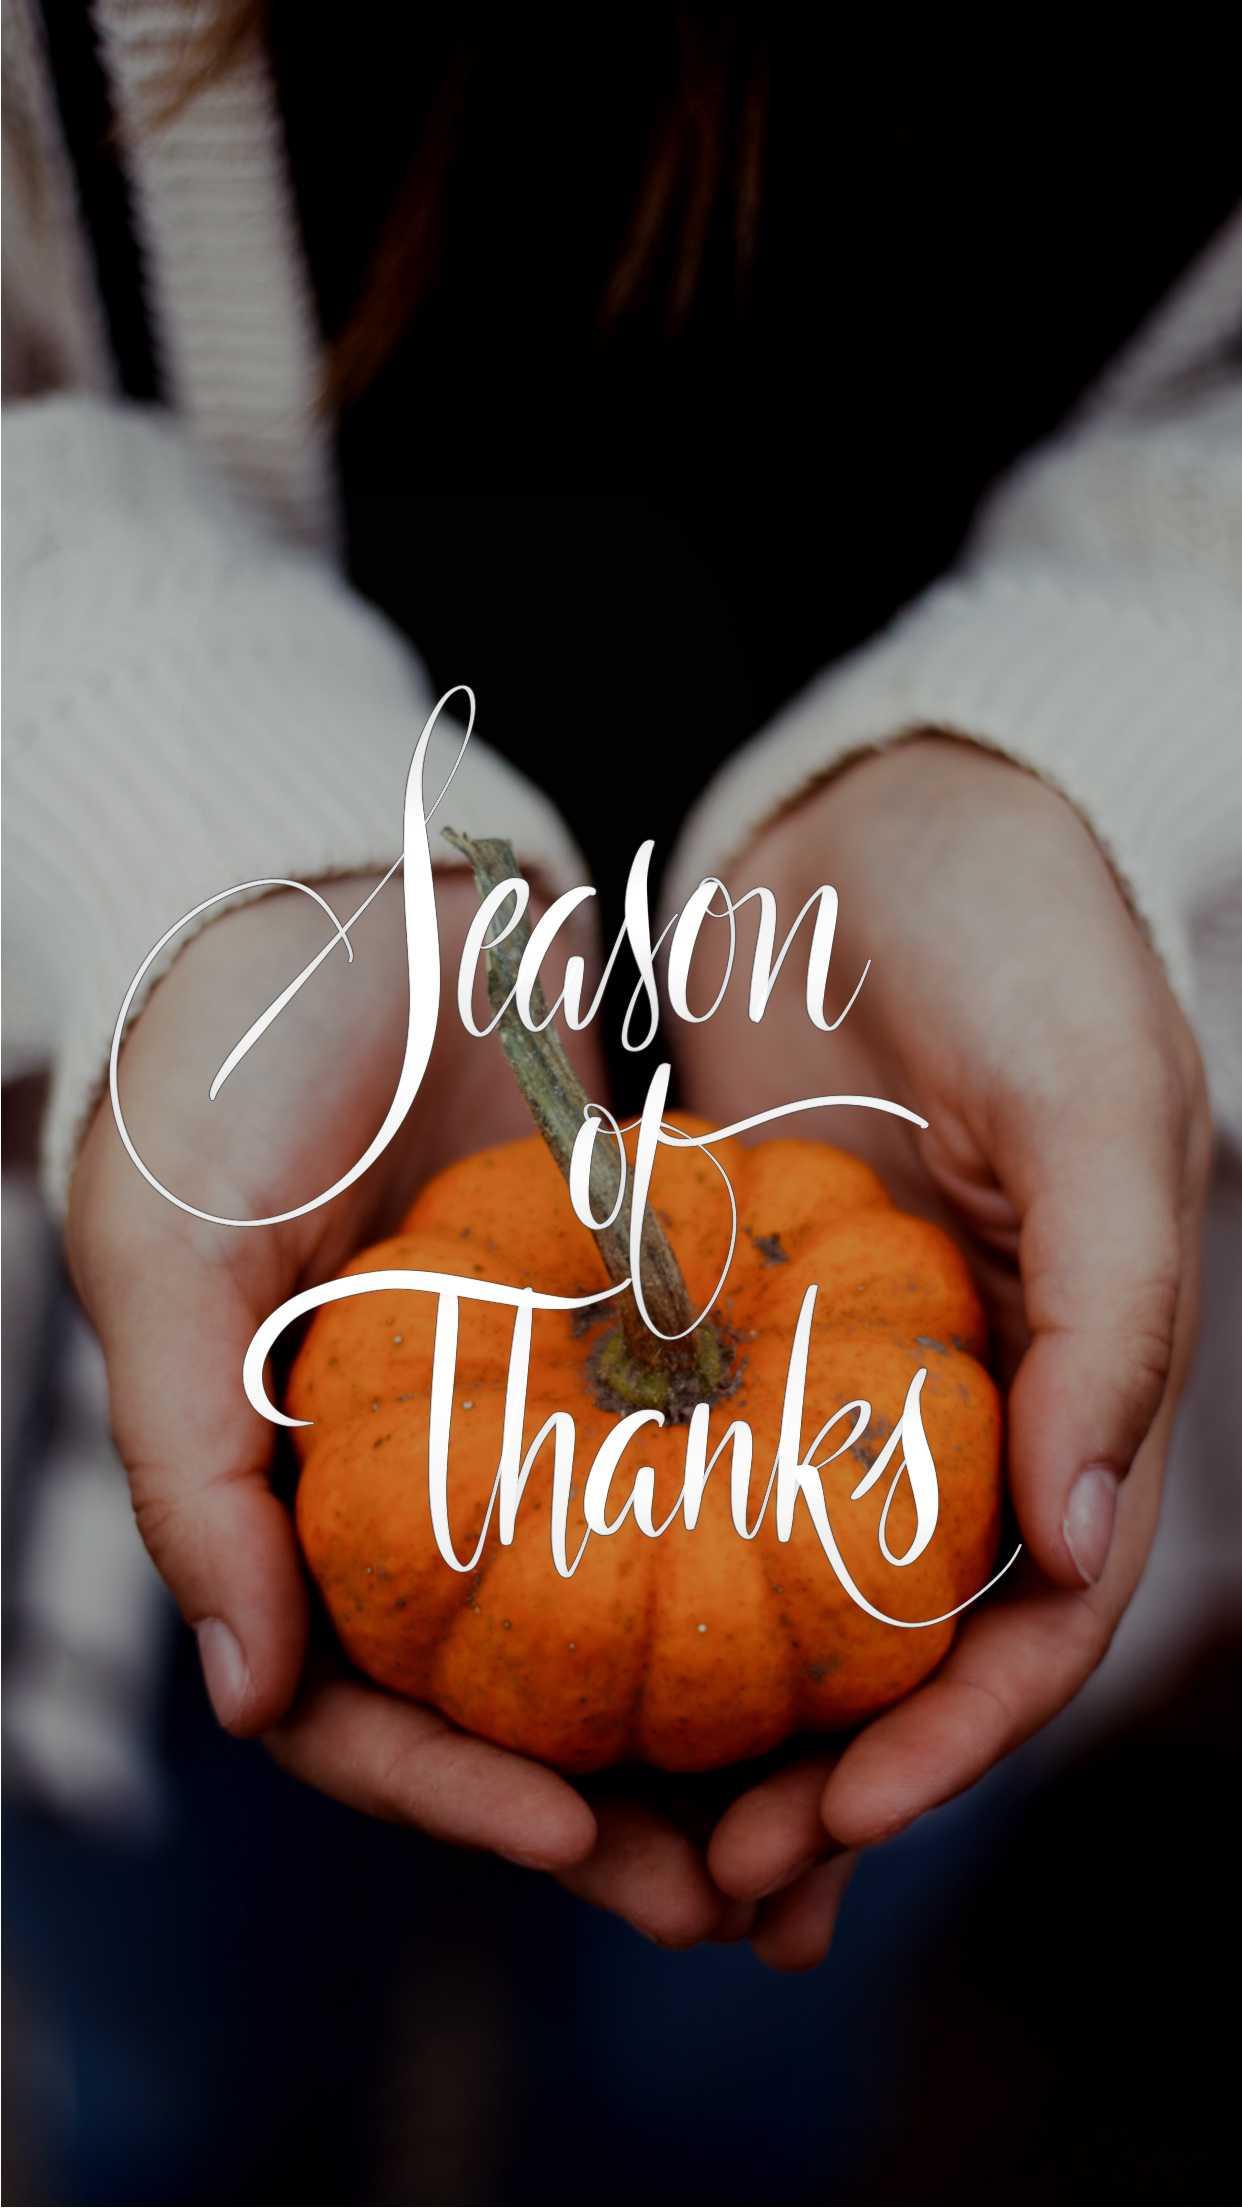 Season of Thanks Wallpaper